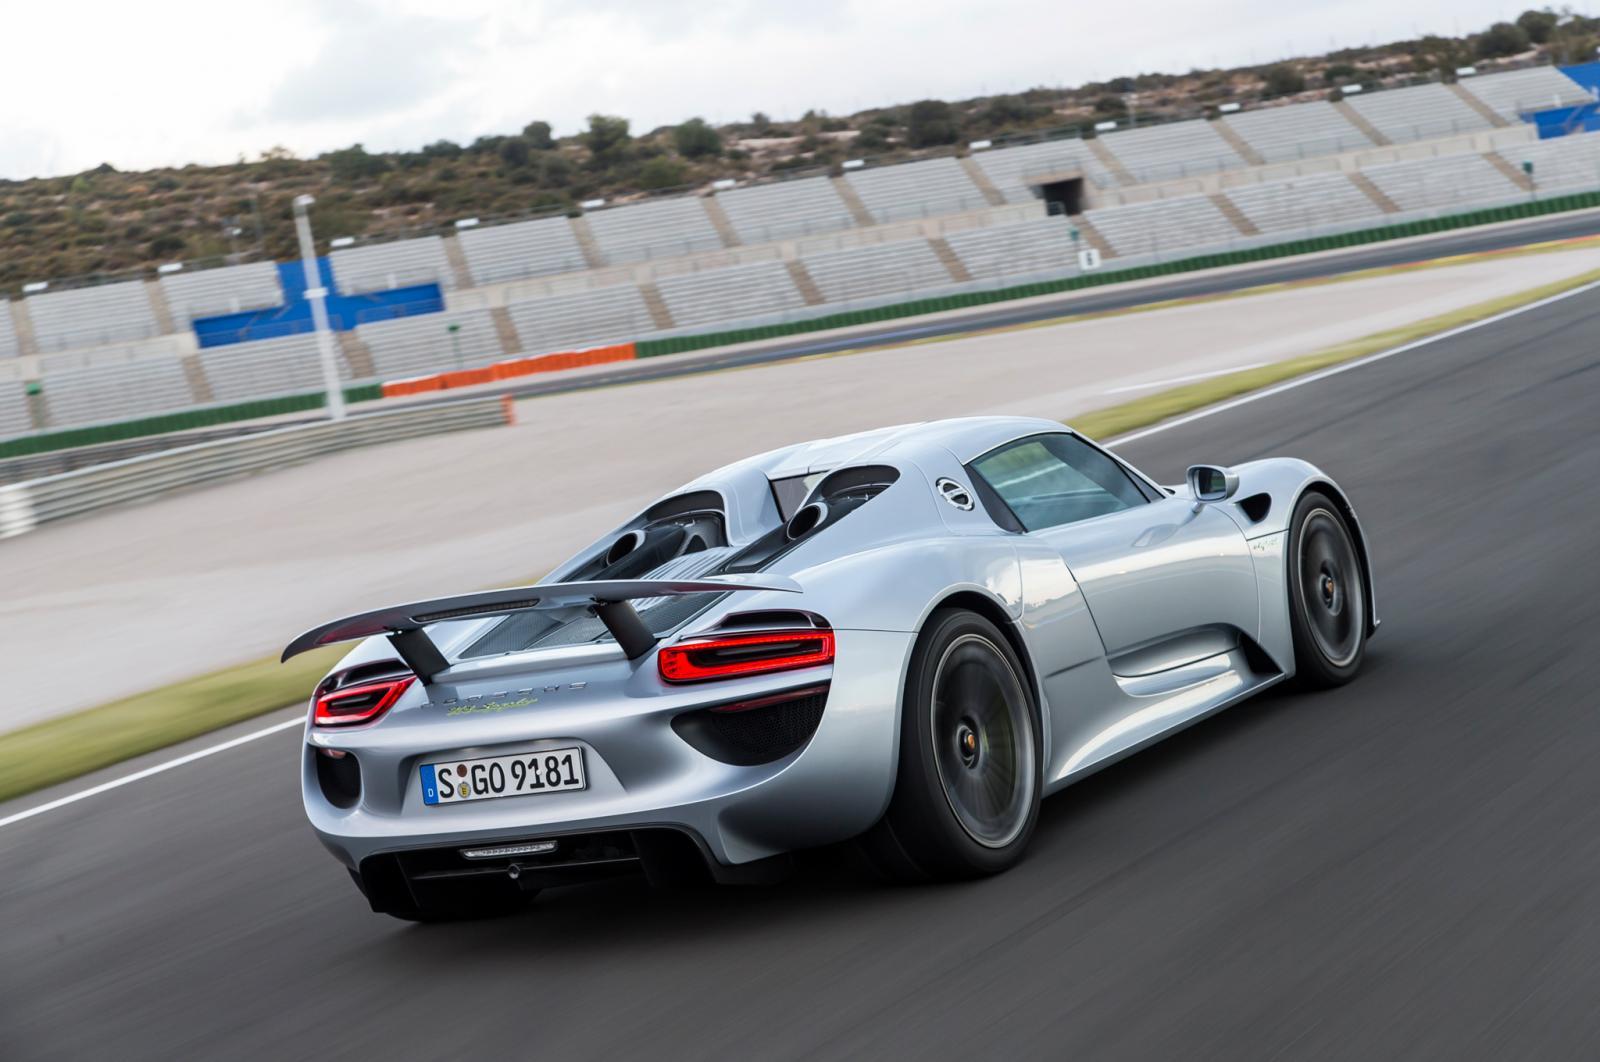 800 1024 1280 1600 Origin 2015 Porsche 918